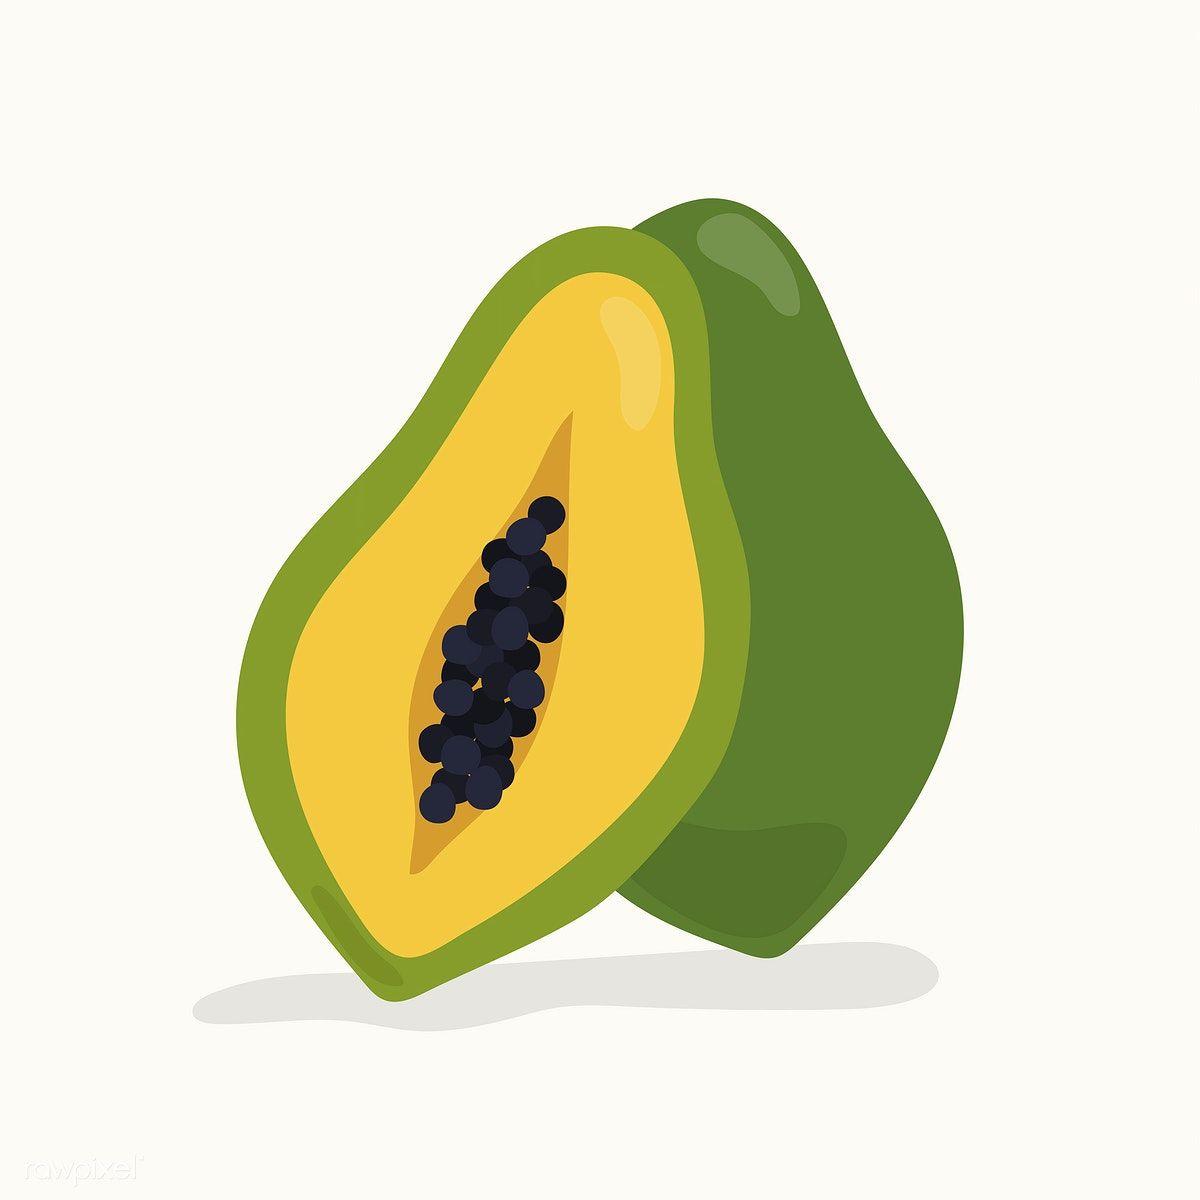 1200x1200 Hand Drawn Papaya Fruit Illustration Free Image